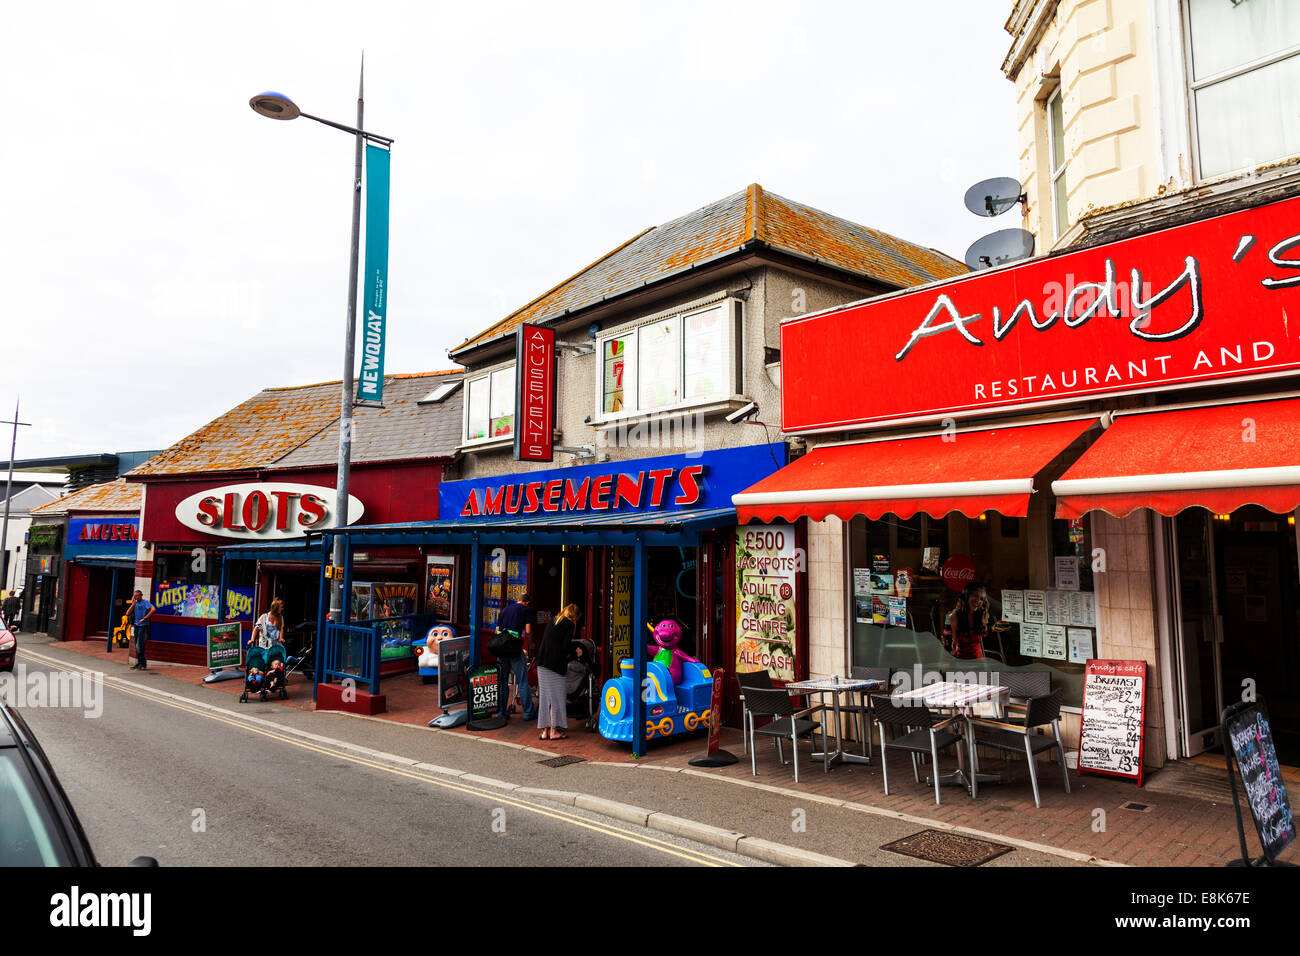 Newquay amusement amusements arcade arcades slot machines tourist fun UK England Cornish Cornwall - Stock Image